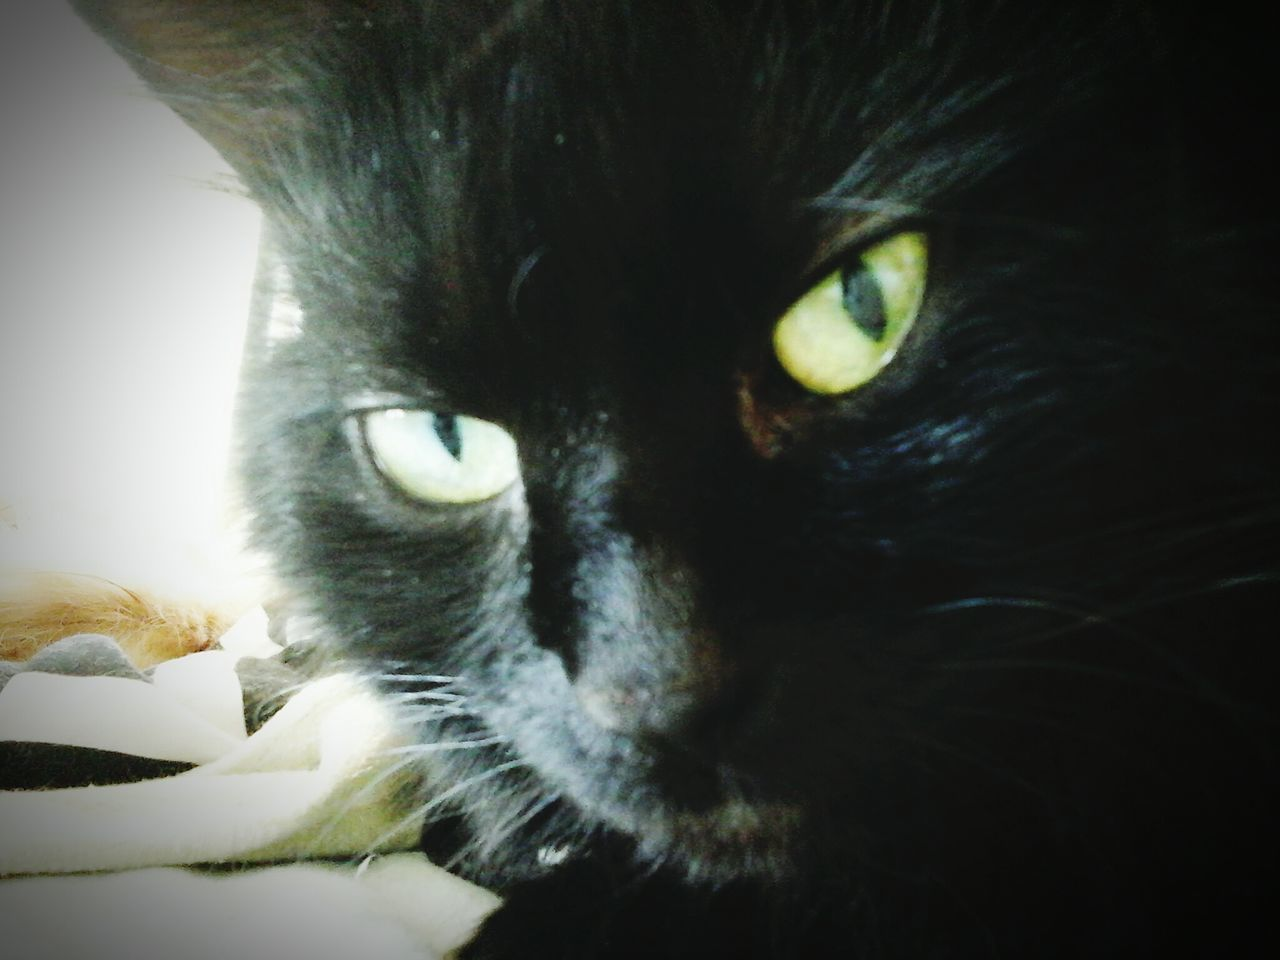 Sophia Maria❤💜❤💜 Catsofeyeem Bayareaphotography Catstarcat Animal Photography Catlovers Cat Eyes Animals Pawsome Hello World ❤️🔥❤️ Paws And Purrs Loveallanimals Blackcatbeauties Blackcats Blackcatsrule